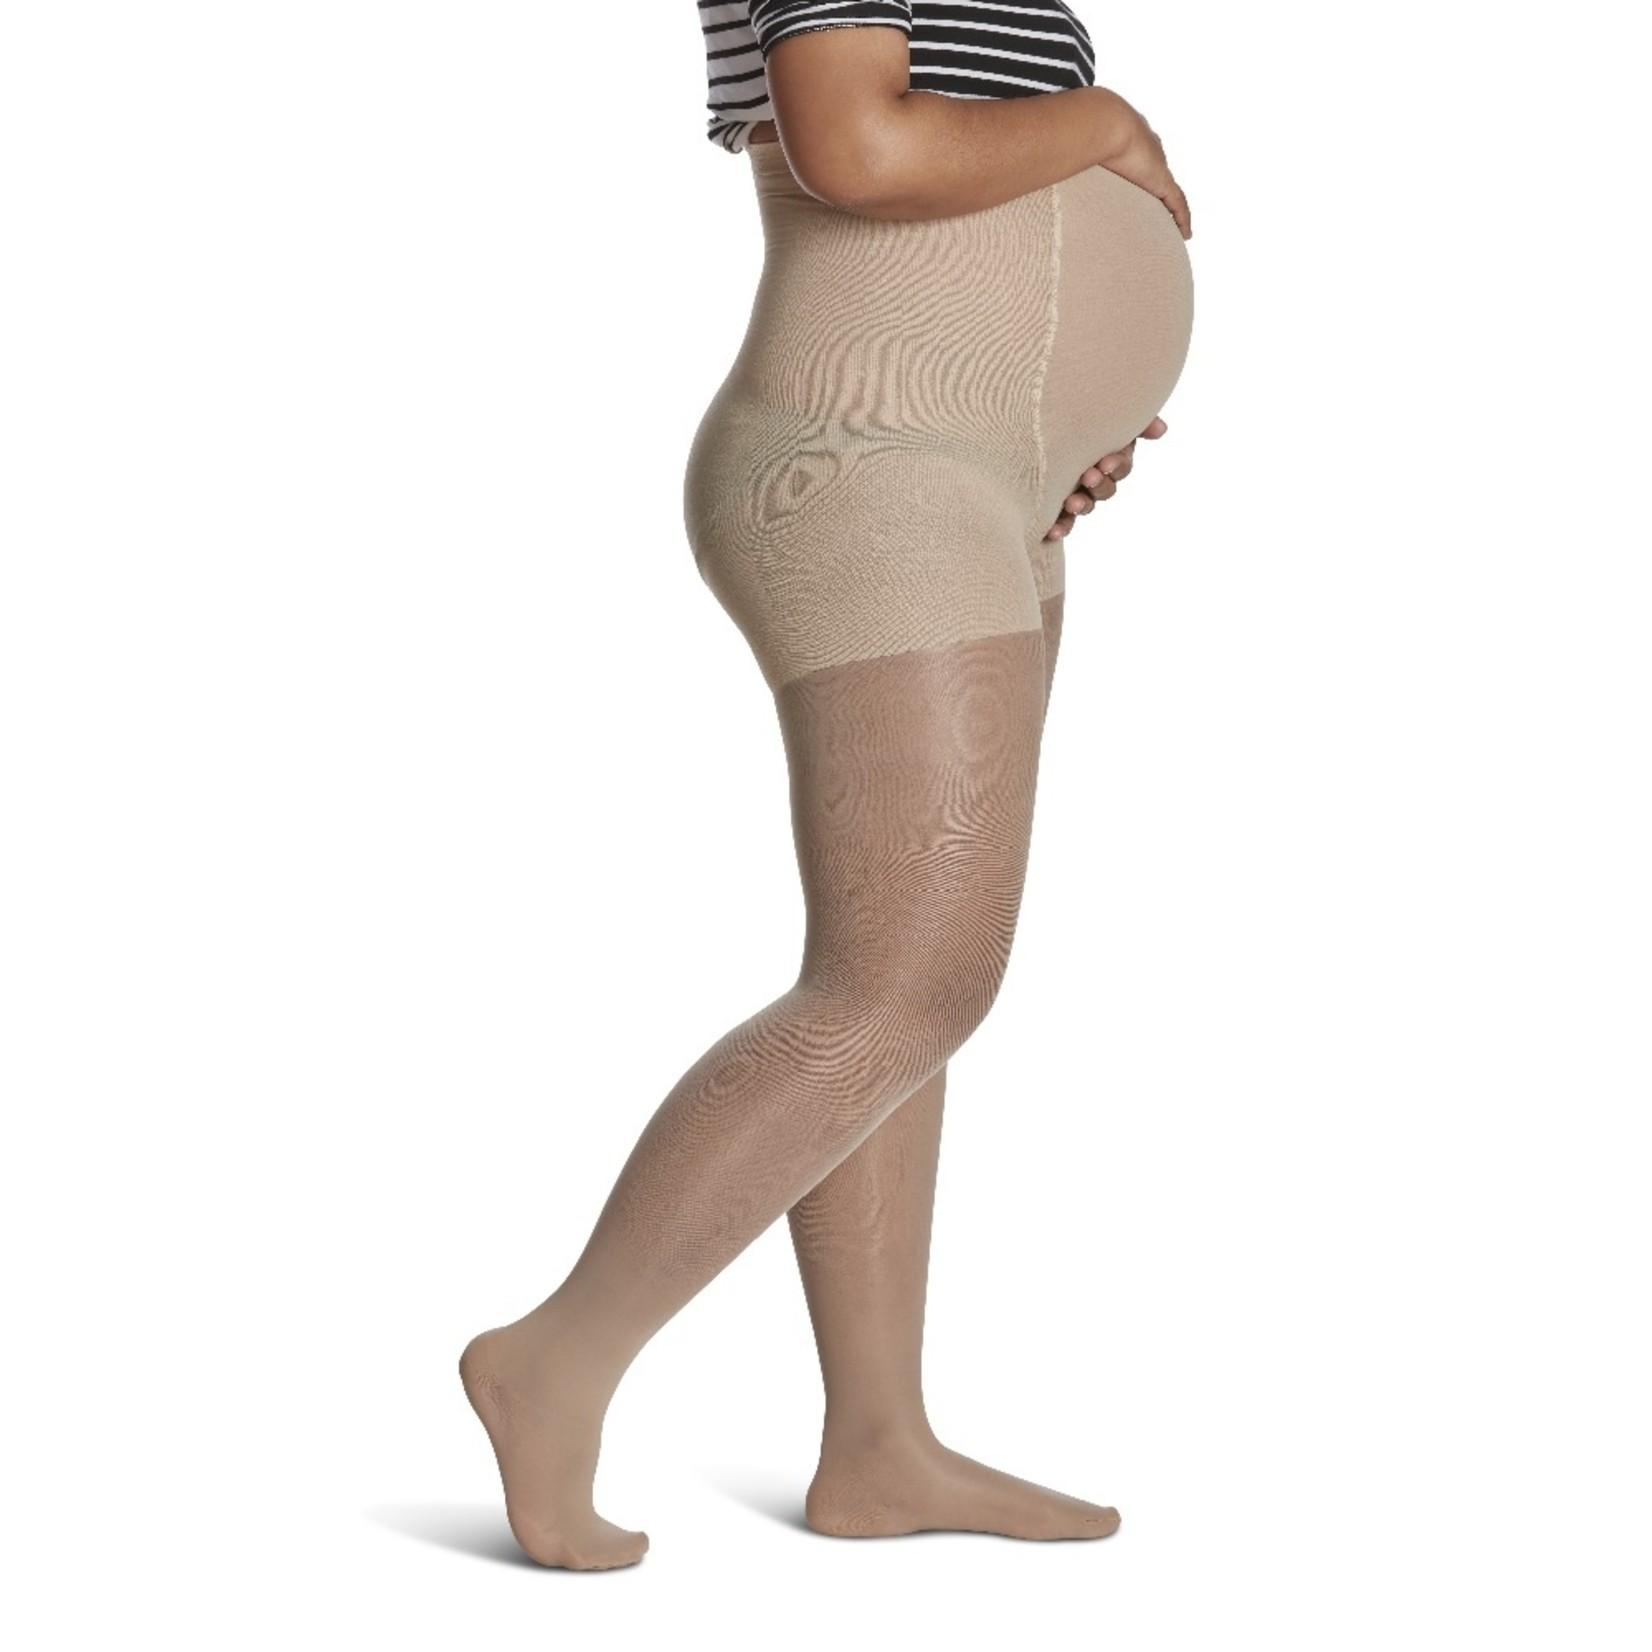 SIGVARIS Women's Sheer Fashion Maternity 15-20mmHg